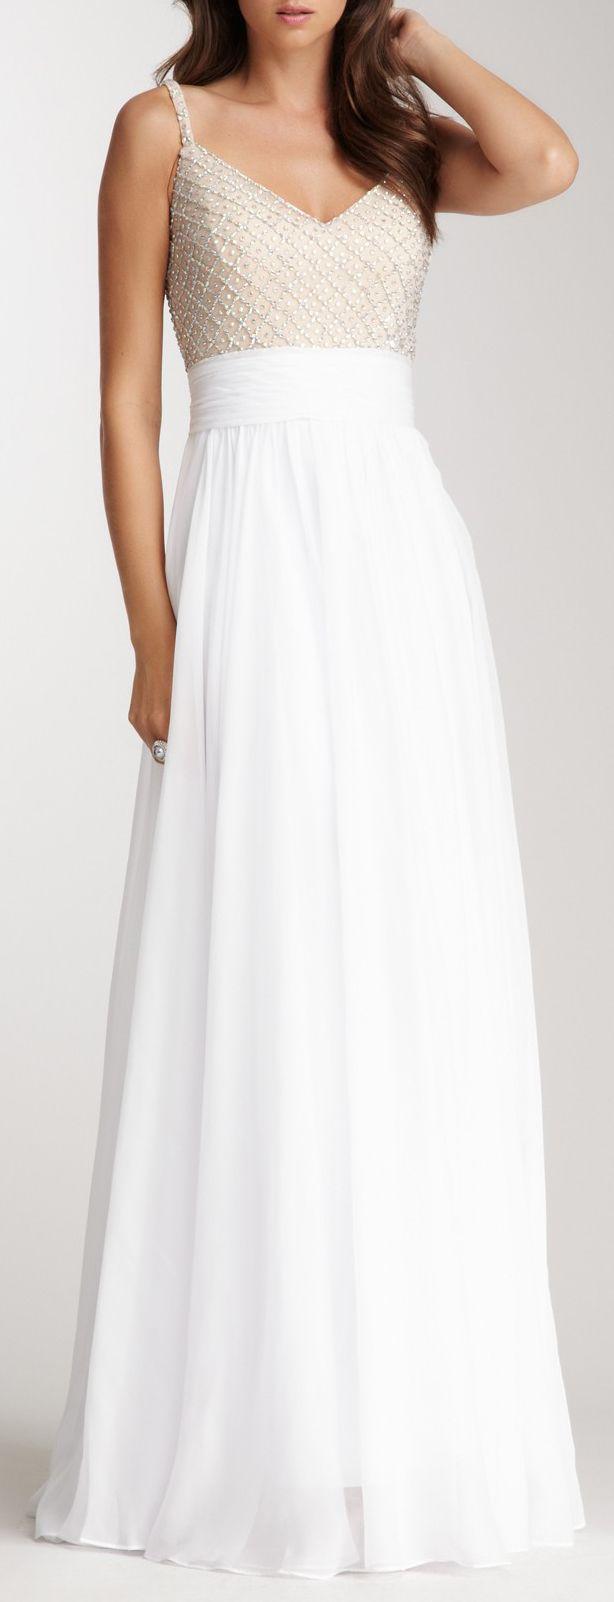 White apron menu oshawa - Beaded Gown